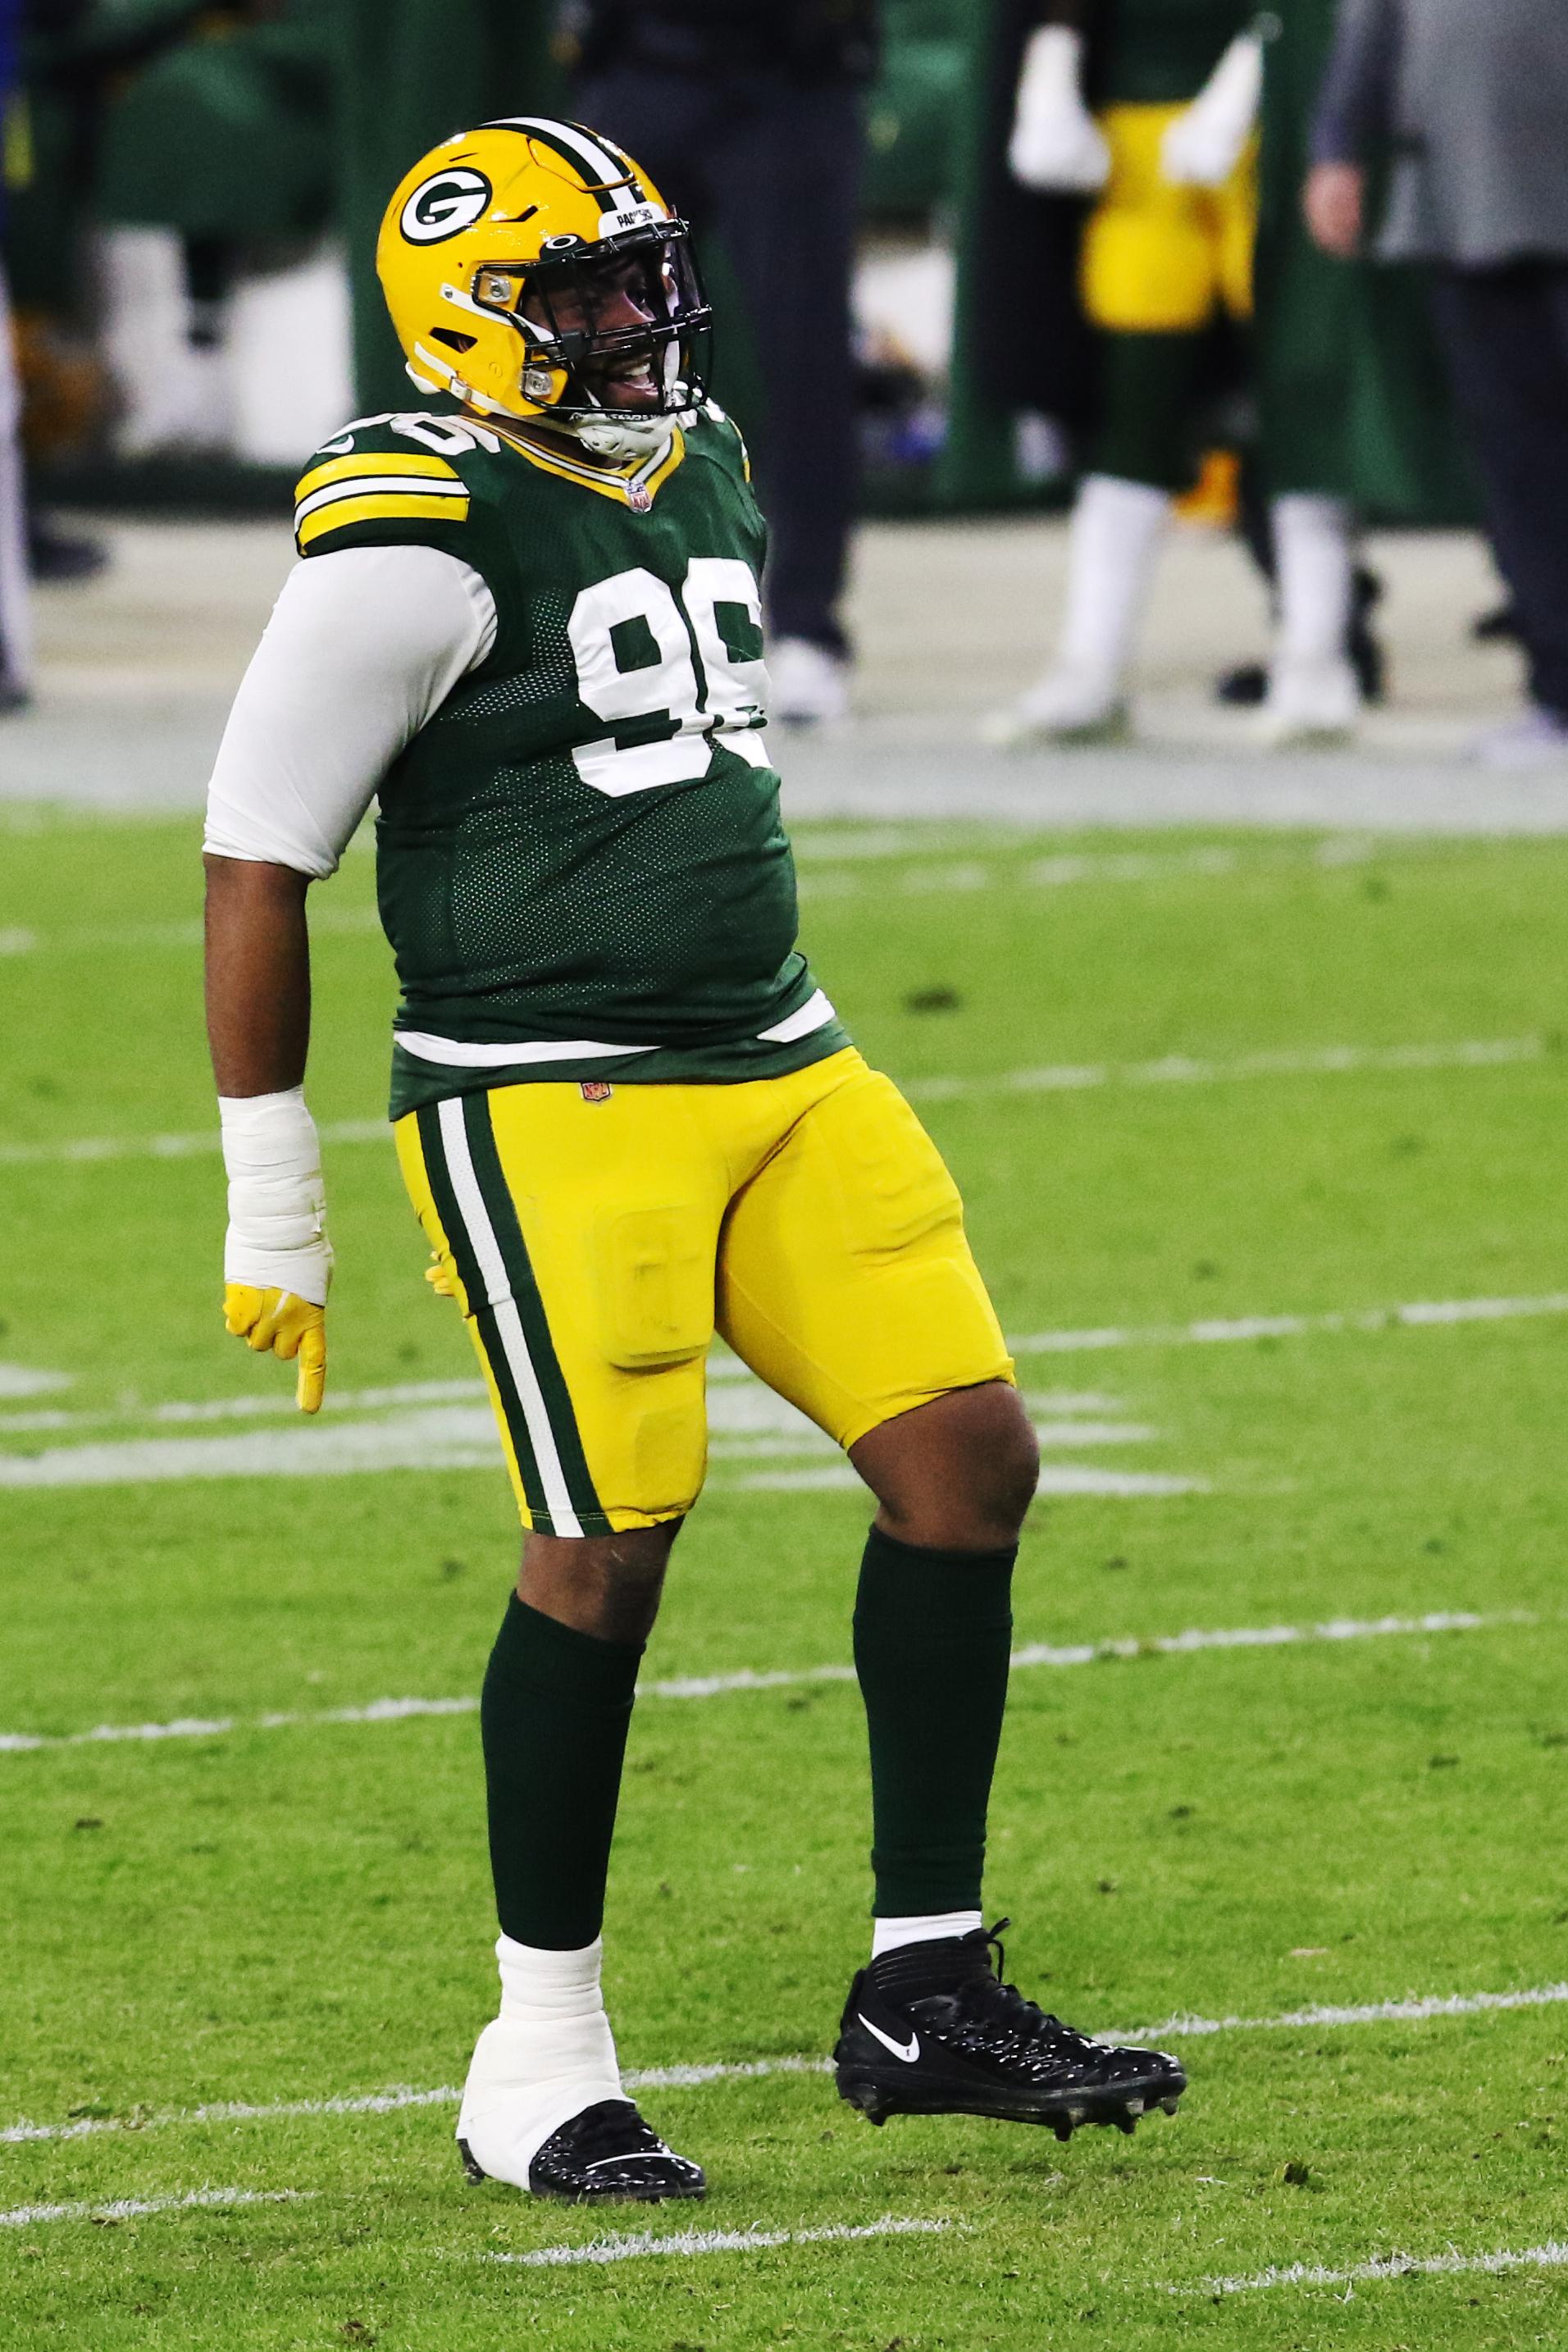 NFL: DEC 06 Eagles at Packers